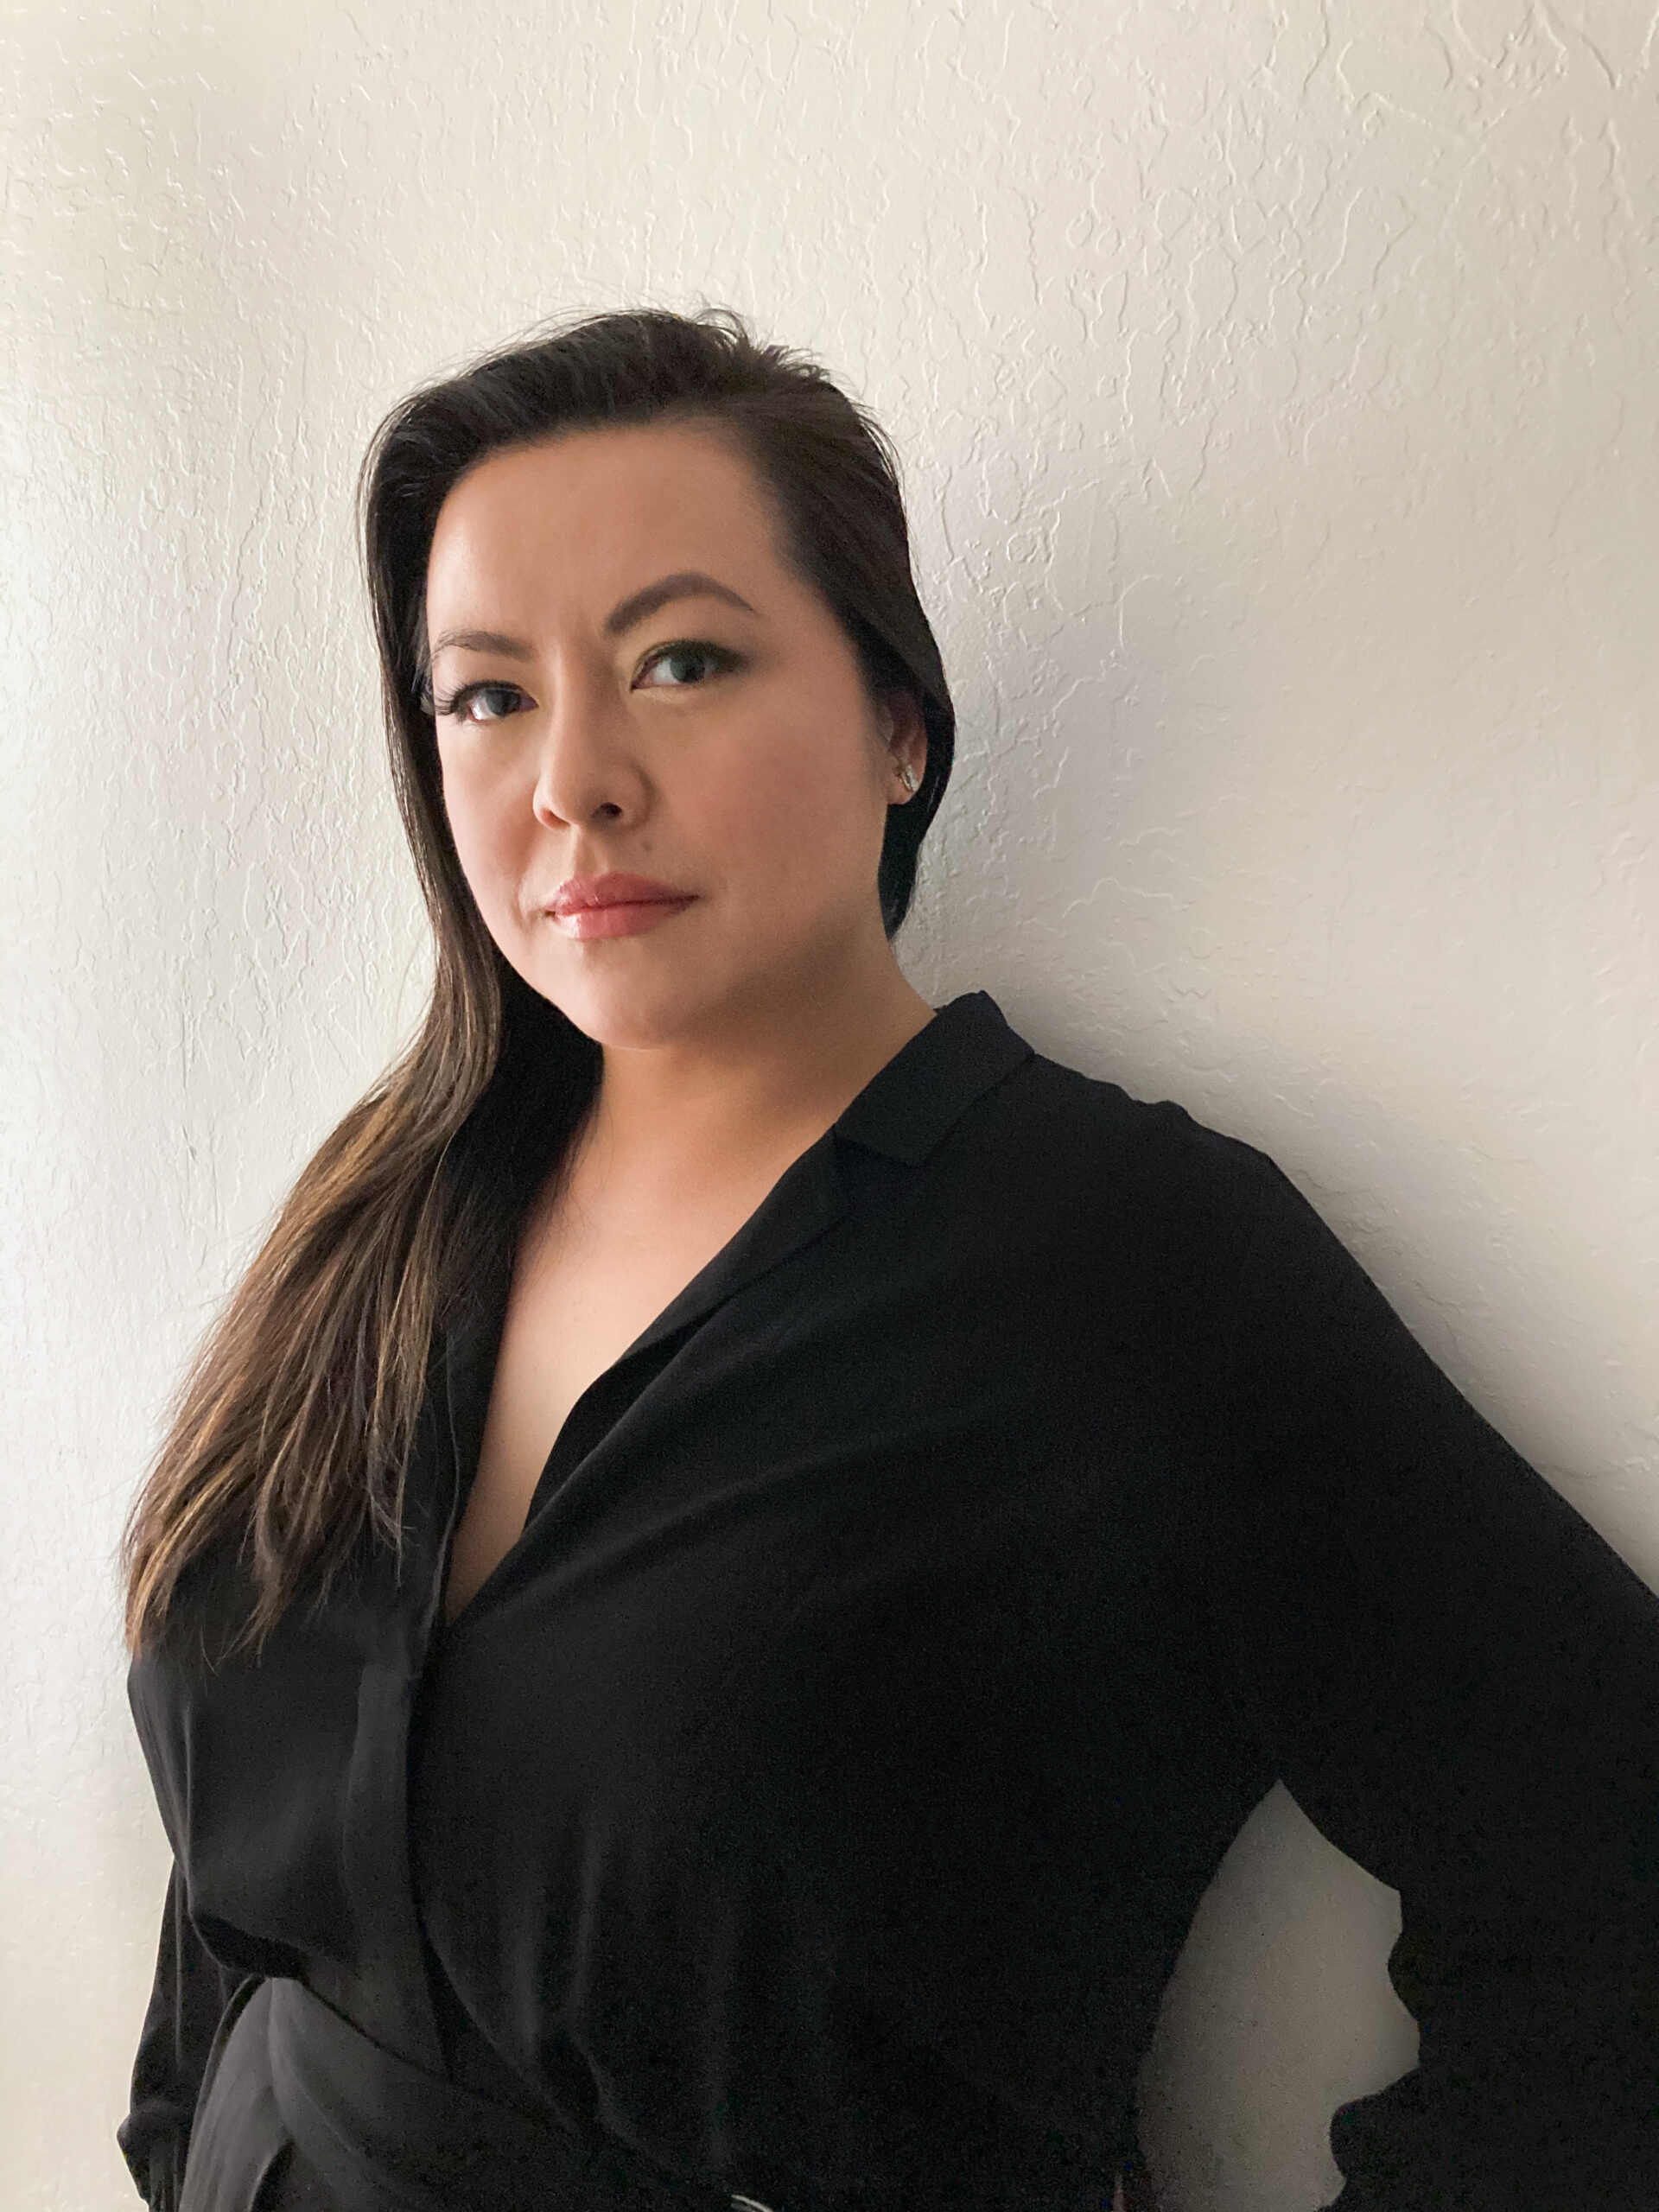 Headshot of Lisa Lee Herrick